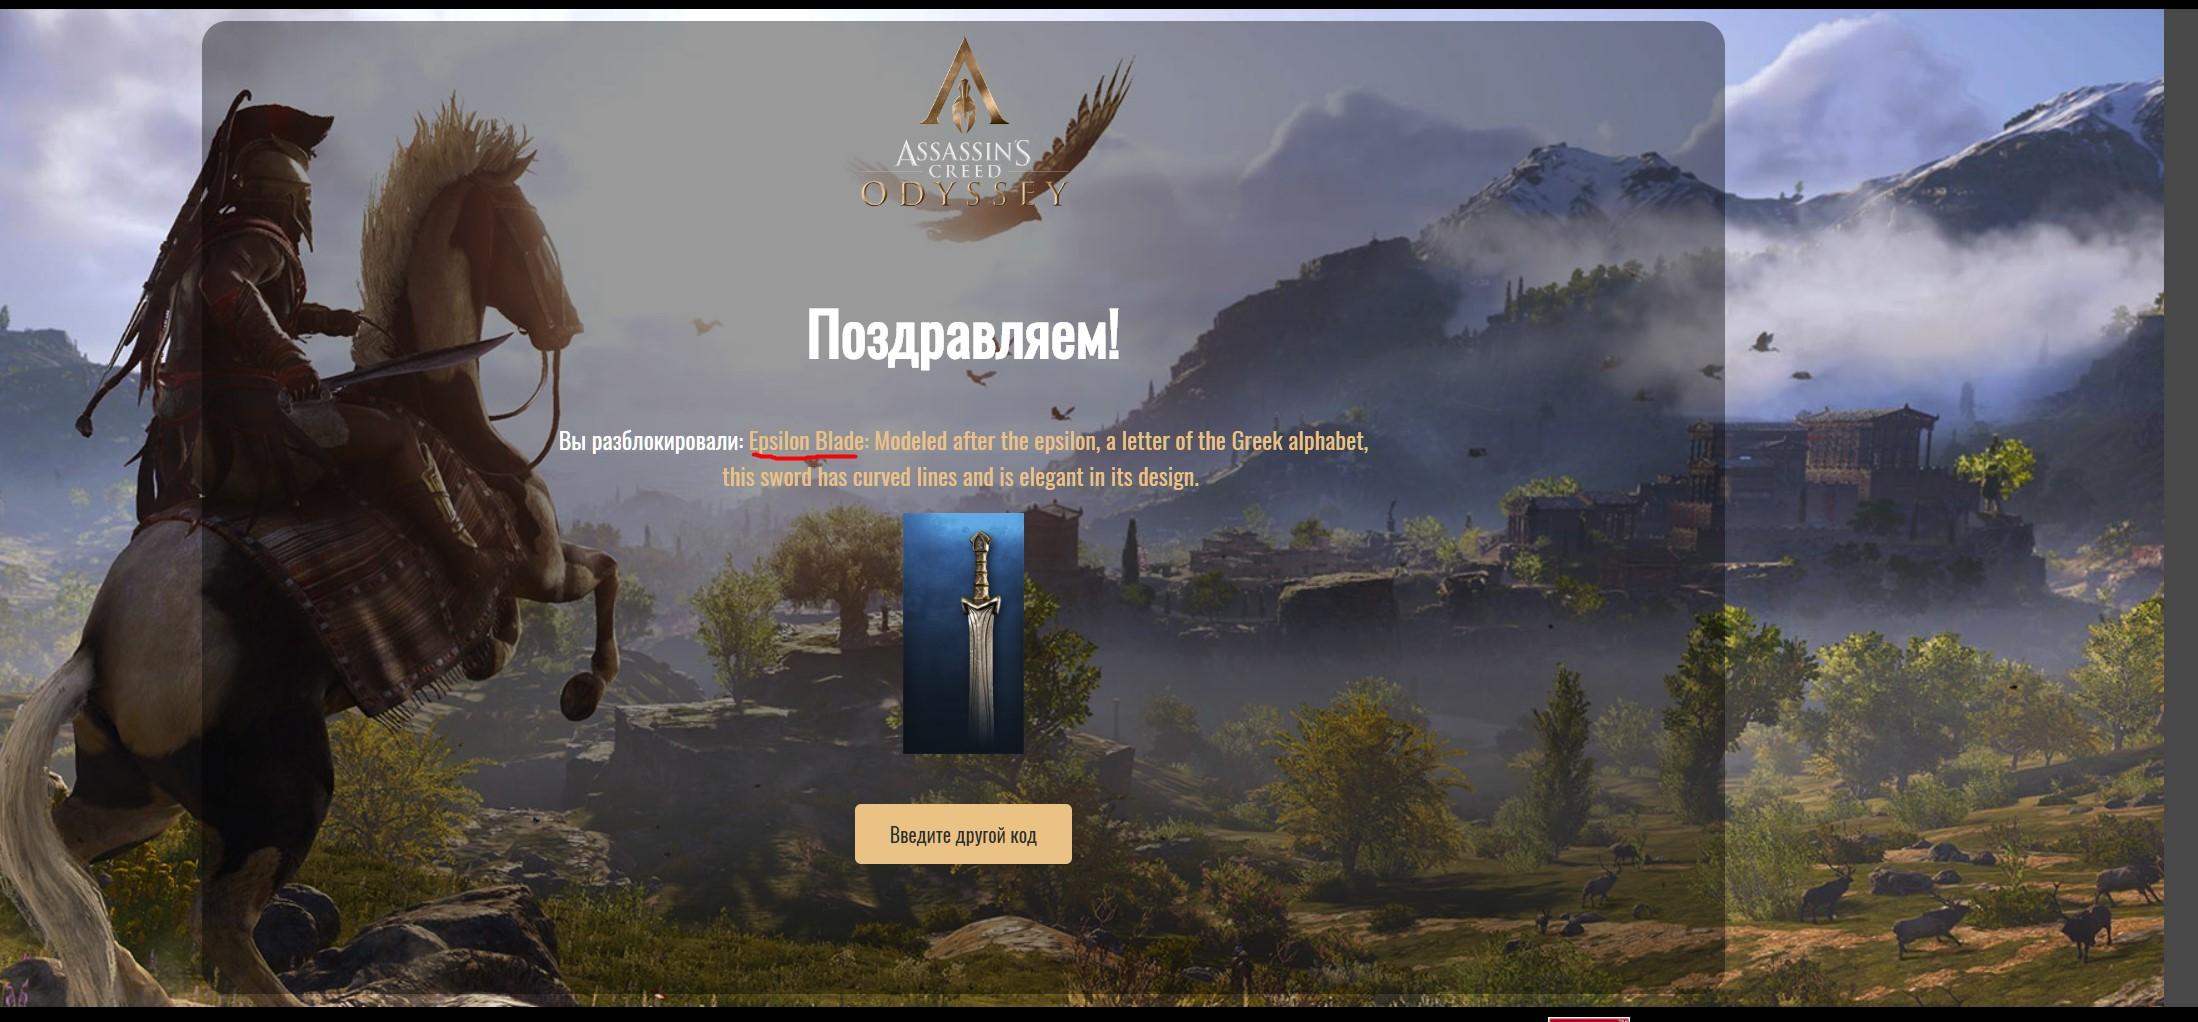 Скриншот 0 - Assassin's Creed Odyssey ТОП АККАУНТ (V1.5.1)+ DLC  Судьба Атлантиды 3 эпизод (ФИНАЛ)